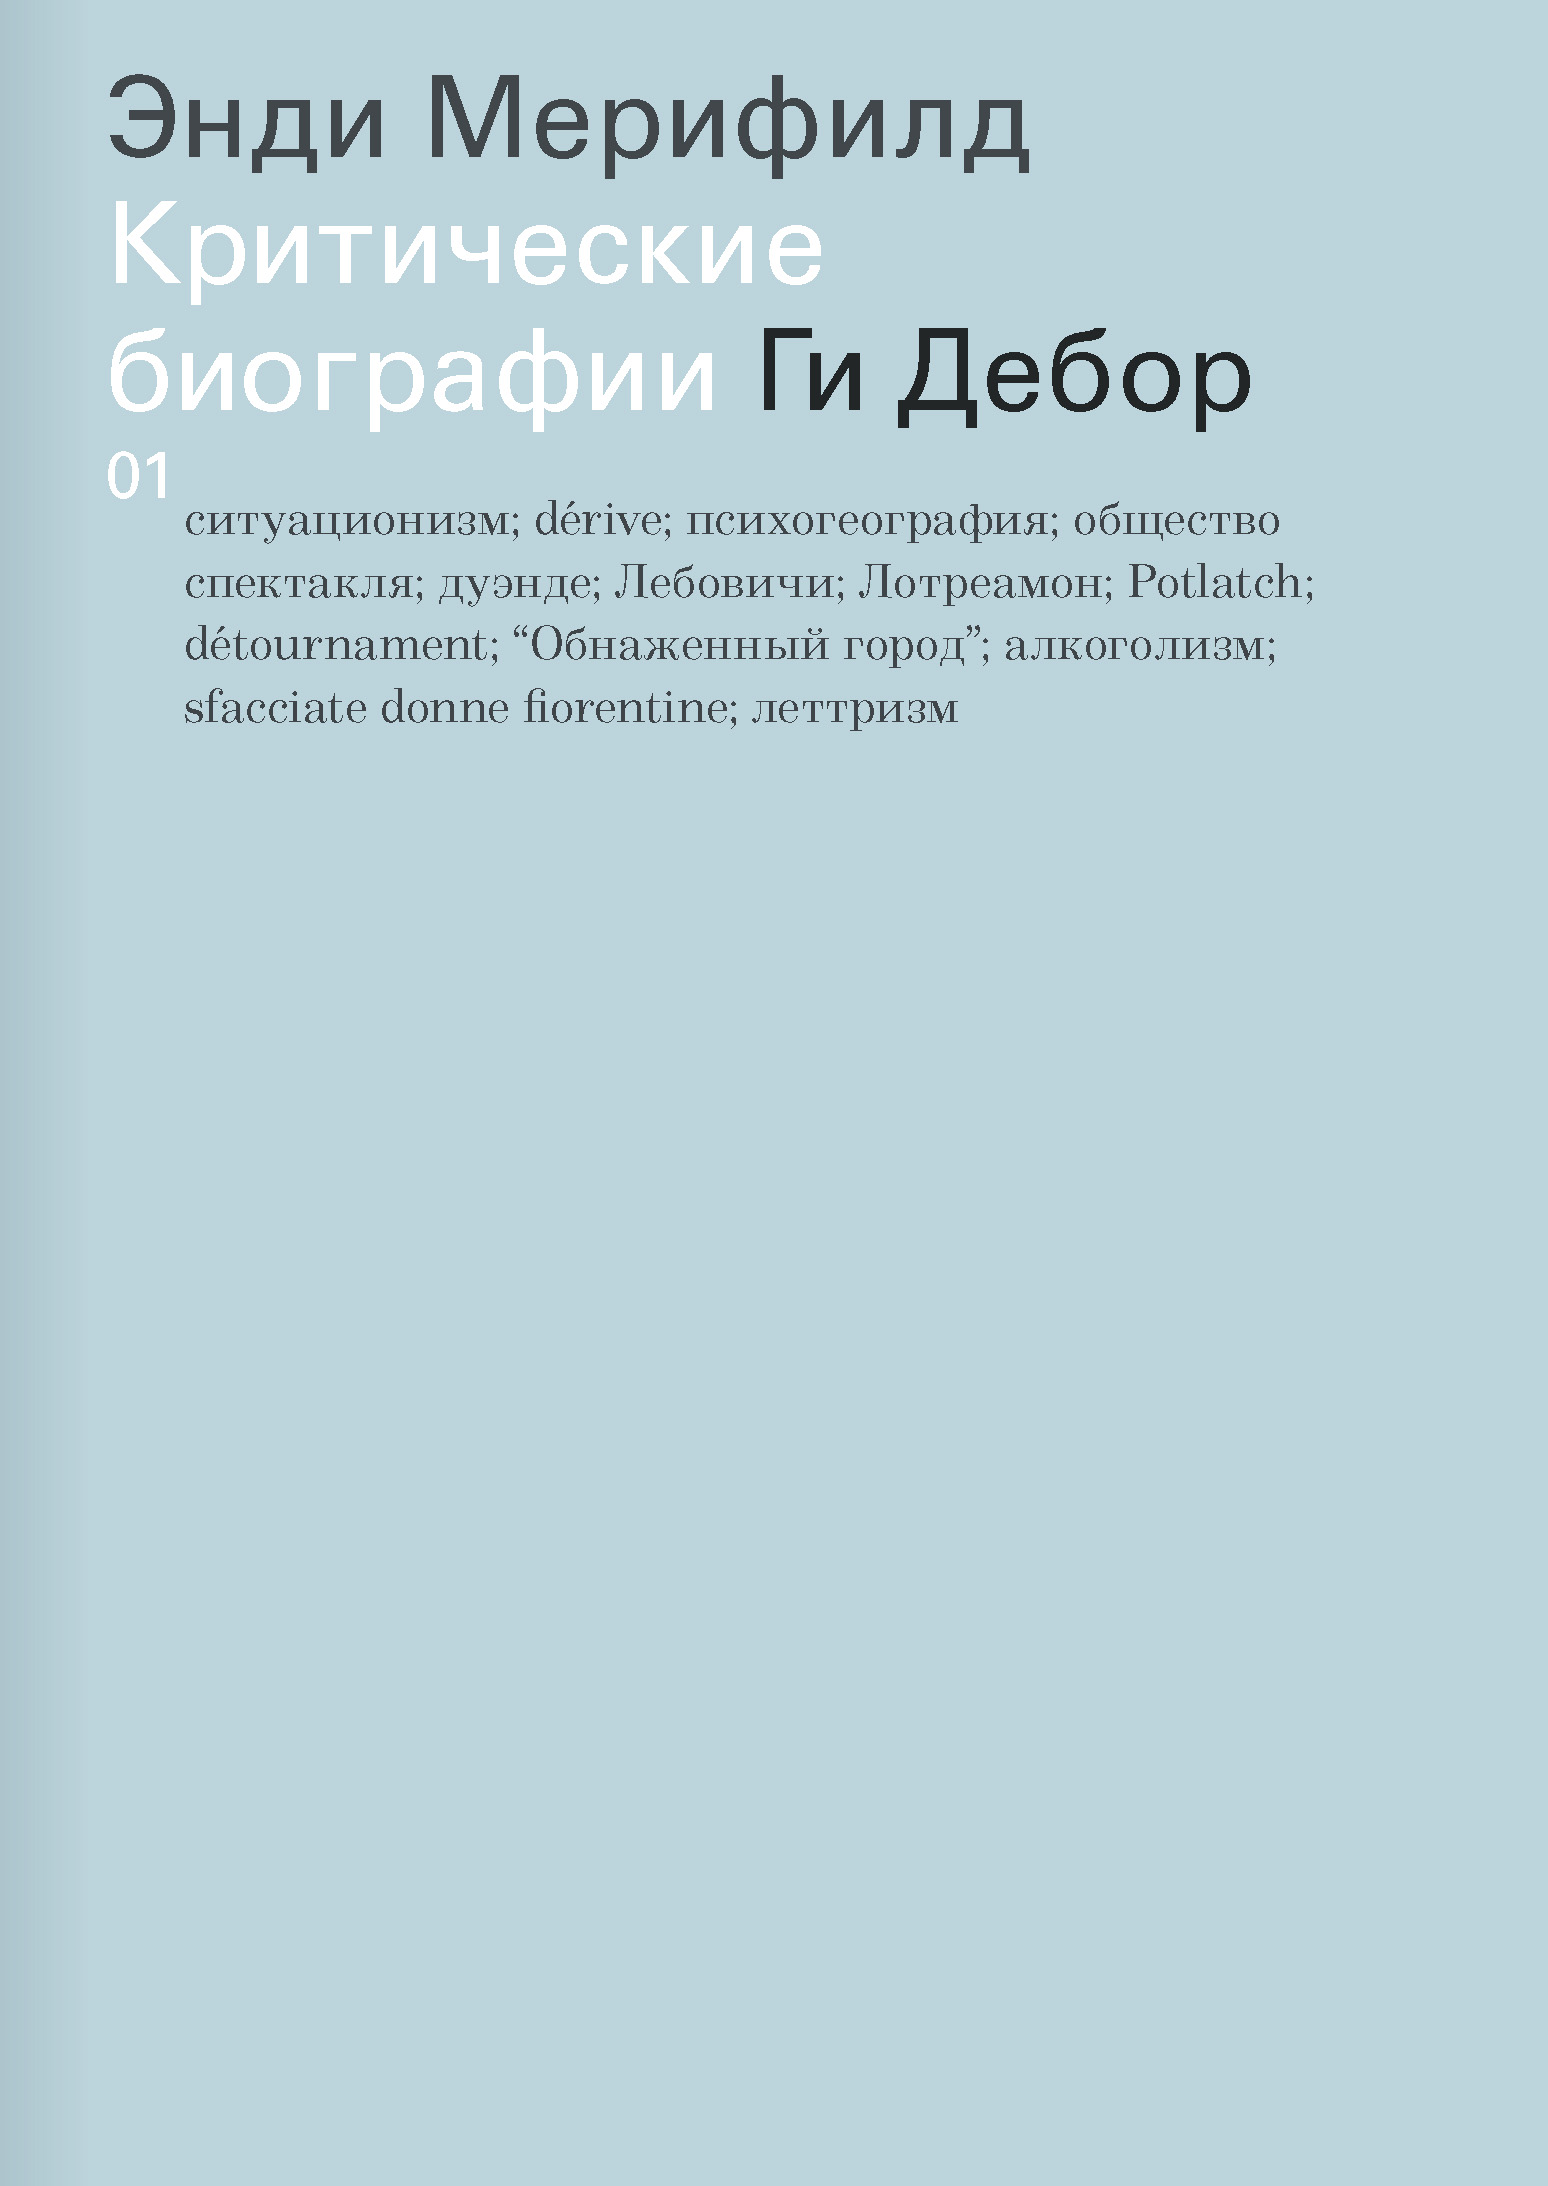 Энди Мерифилд «Ги Дебор. Критические биографии»